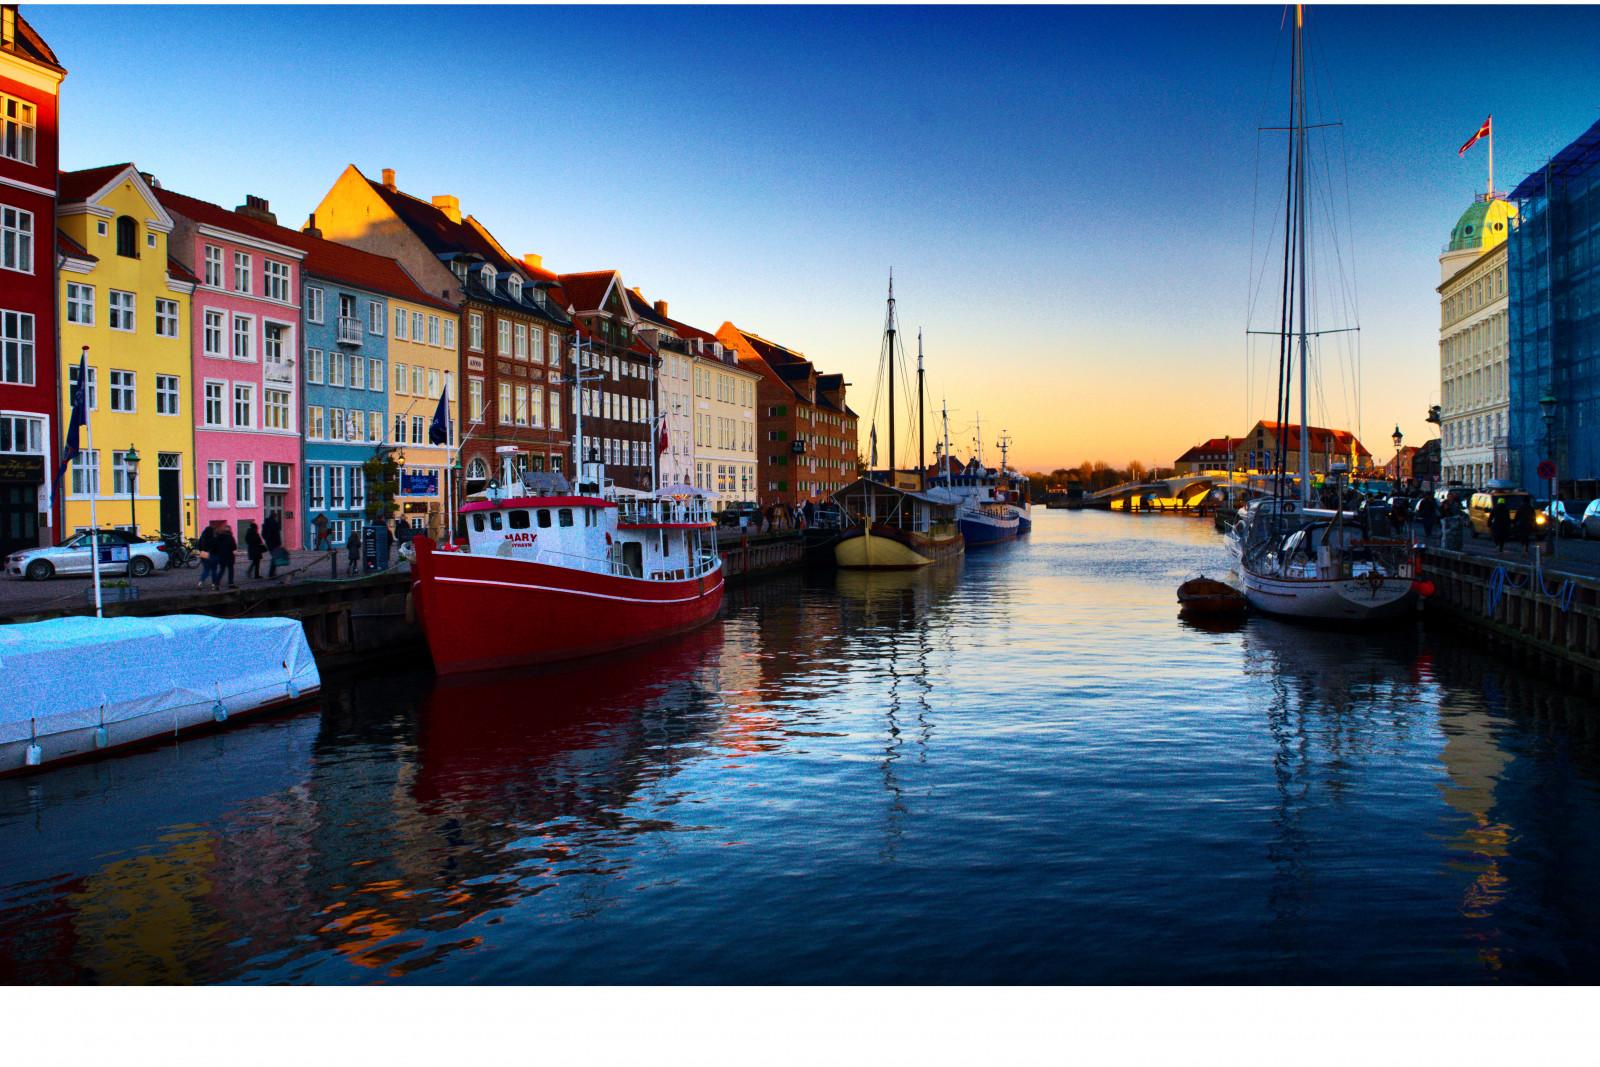 Wallpaper nyhavn copenhagen denmark fairytale 6008x4008 1088368 hd wallpapers wallhere - Copenhagen wallpaper ...